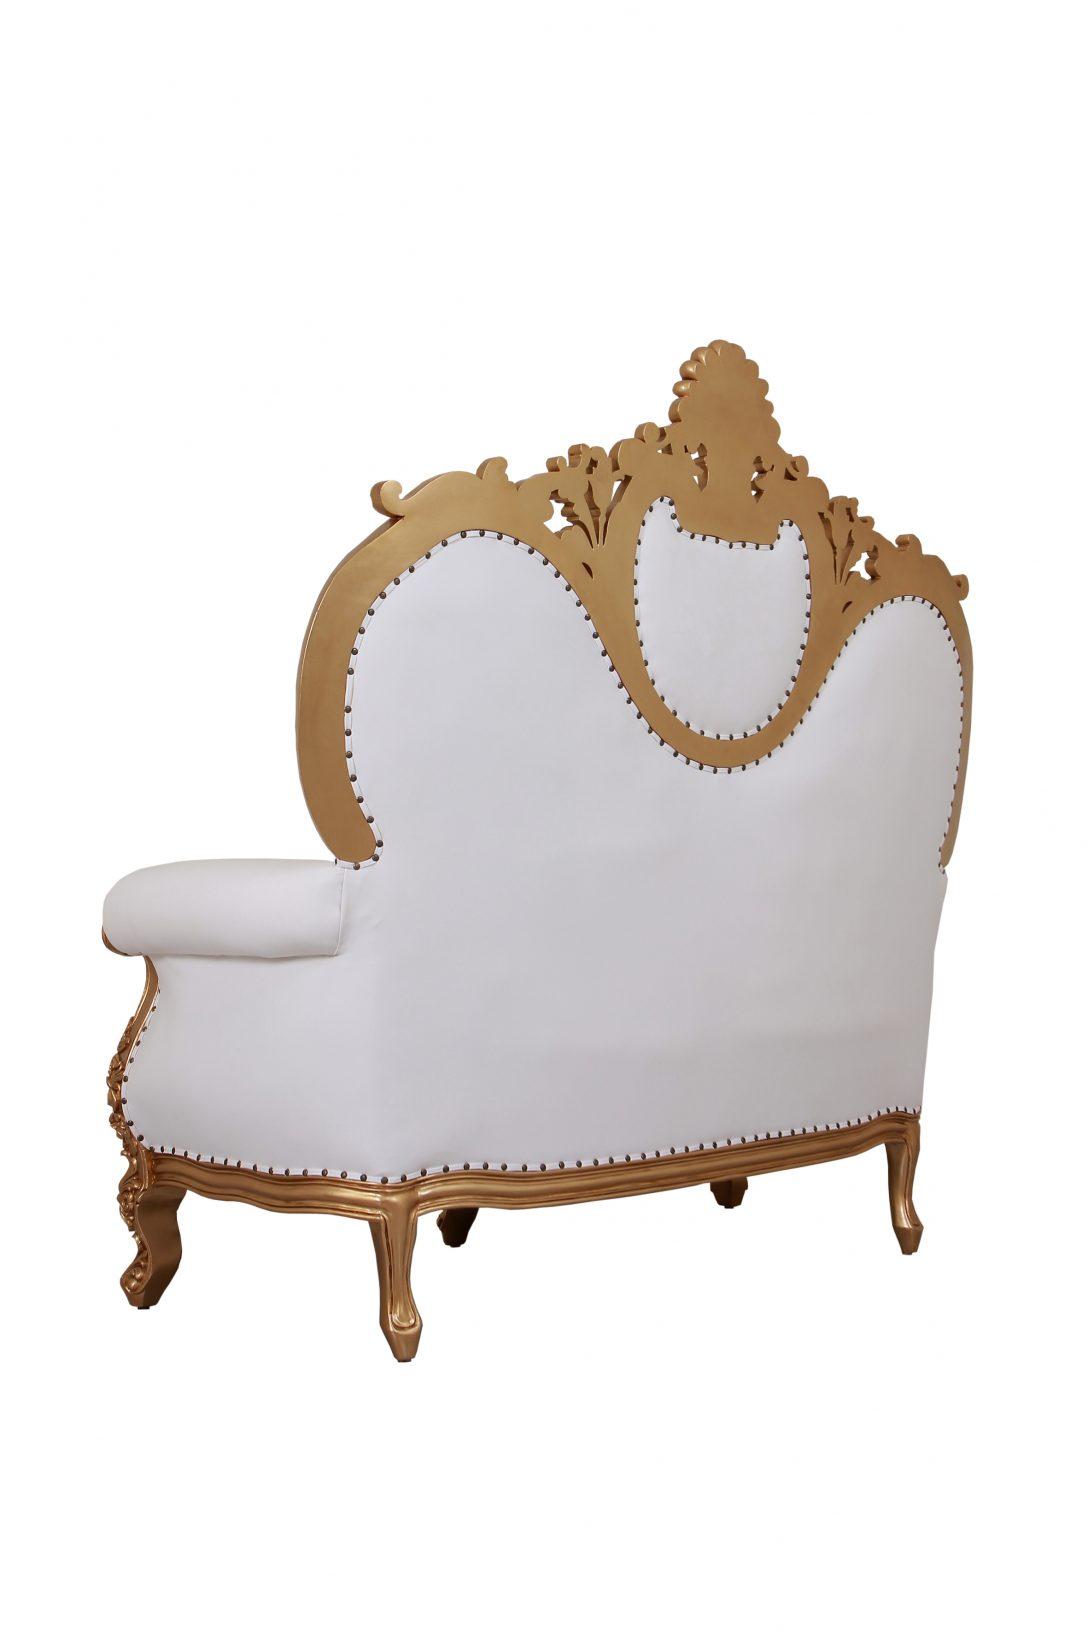 Large Size of Barock Sofa King Chair Luxus Mit Strasssteinen Jb Lashes Wildleder Garnitur Rotes Franz Fertig 3 Teilig Rattan Garten Led L Form Federkern Konfigurator Sofa Barock Sofa